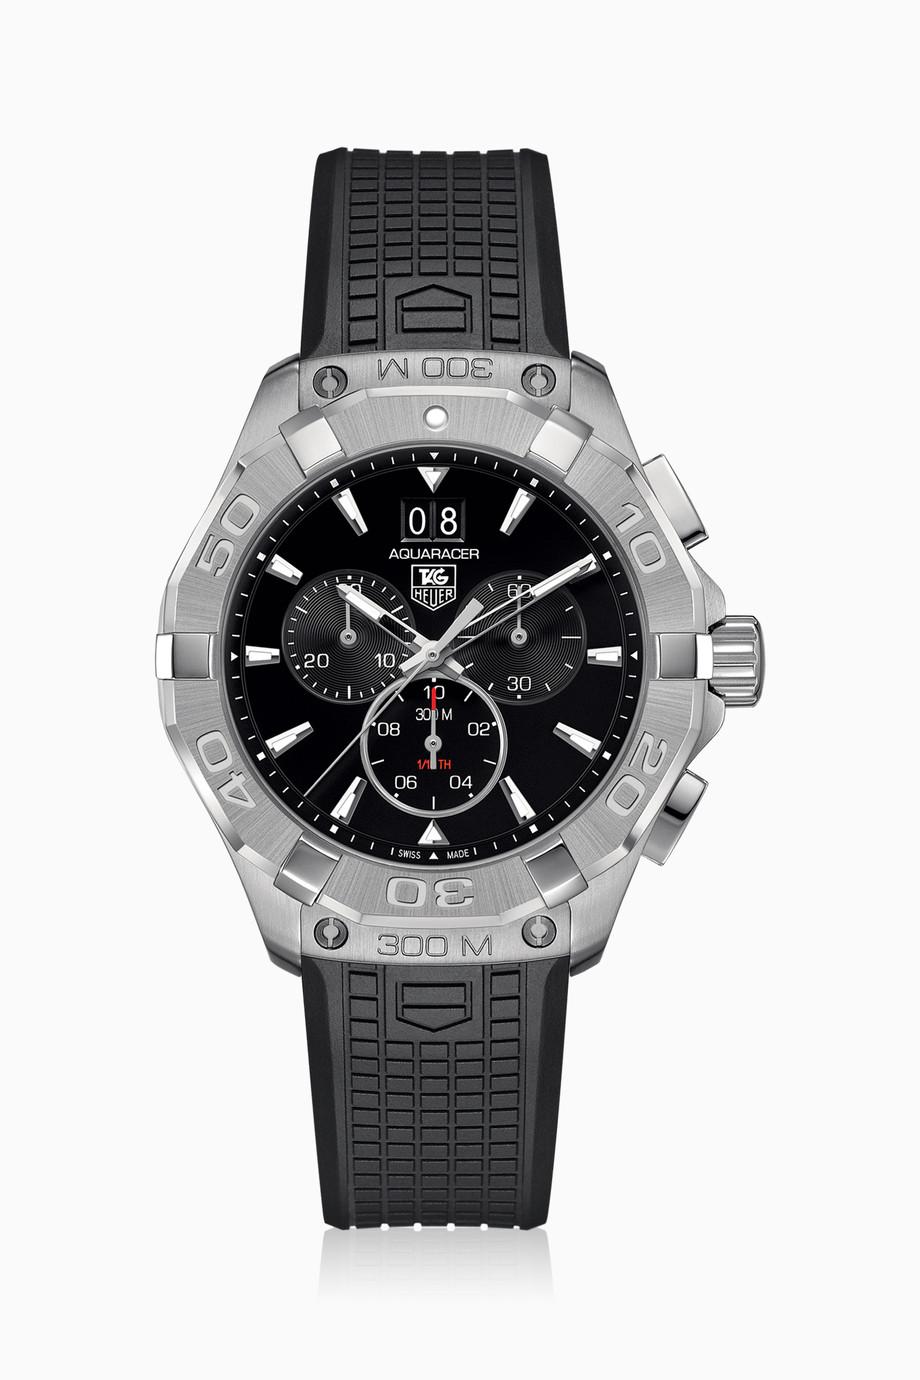 9235e544d تسوق ساعة أكواريسر كرونوغراف TAG Heuer أسود للرجال   اُناس الامارات